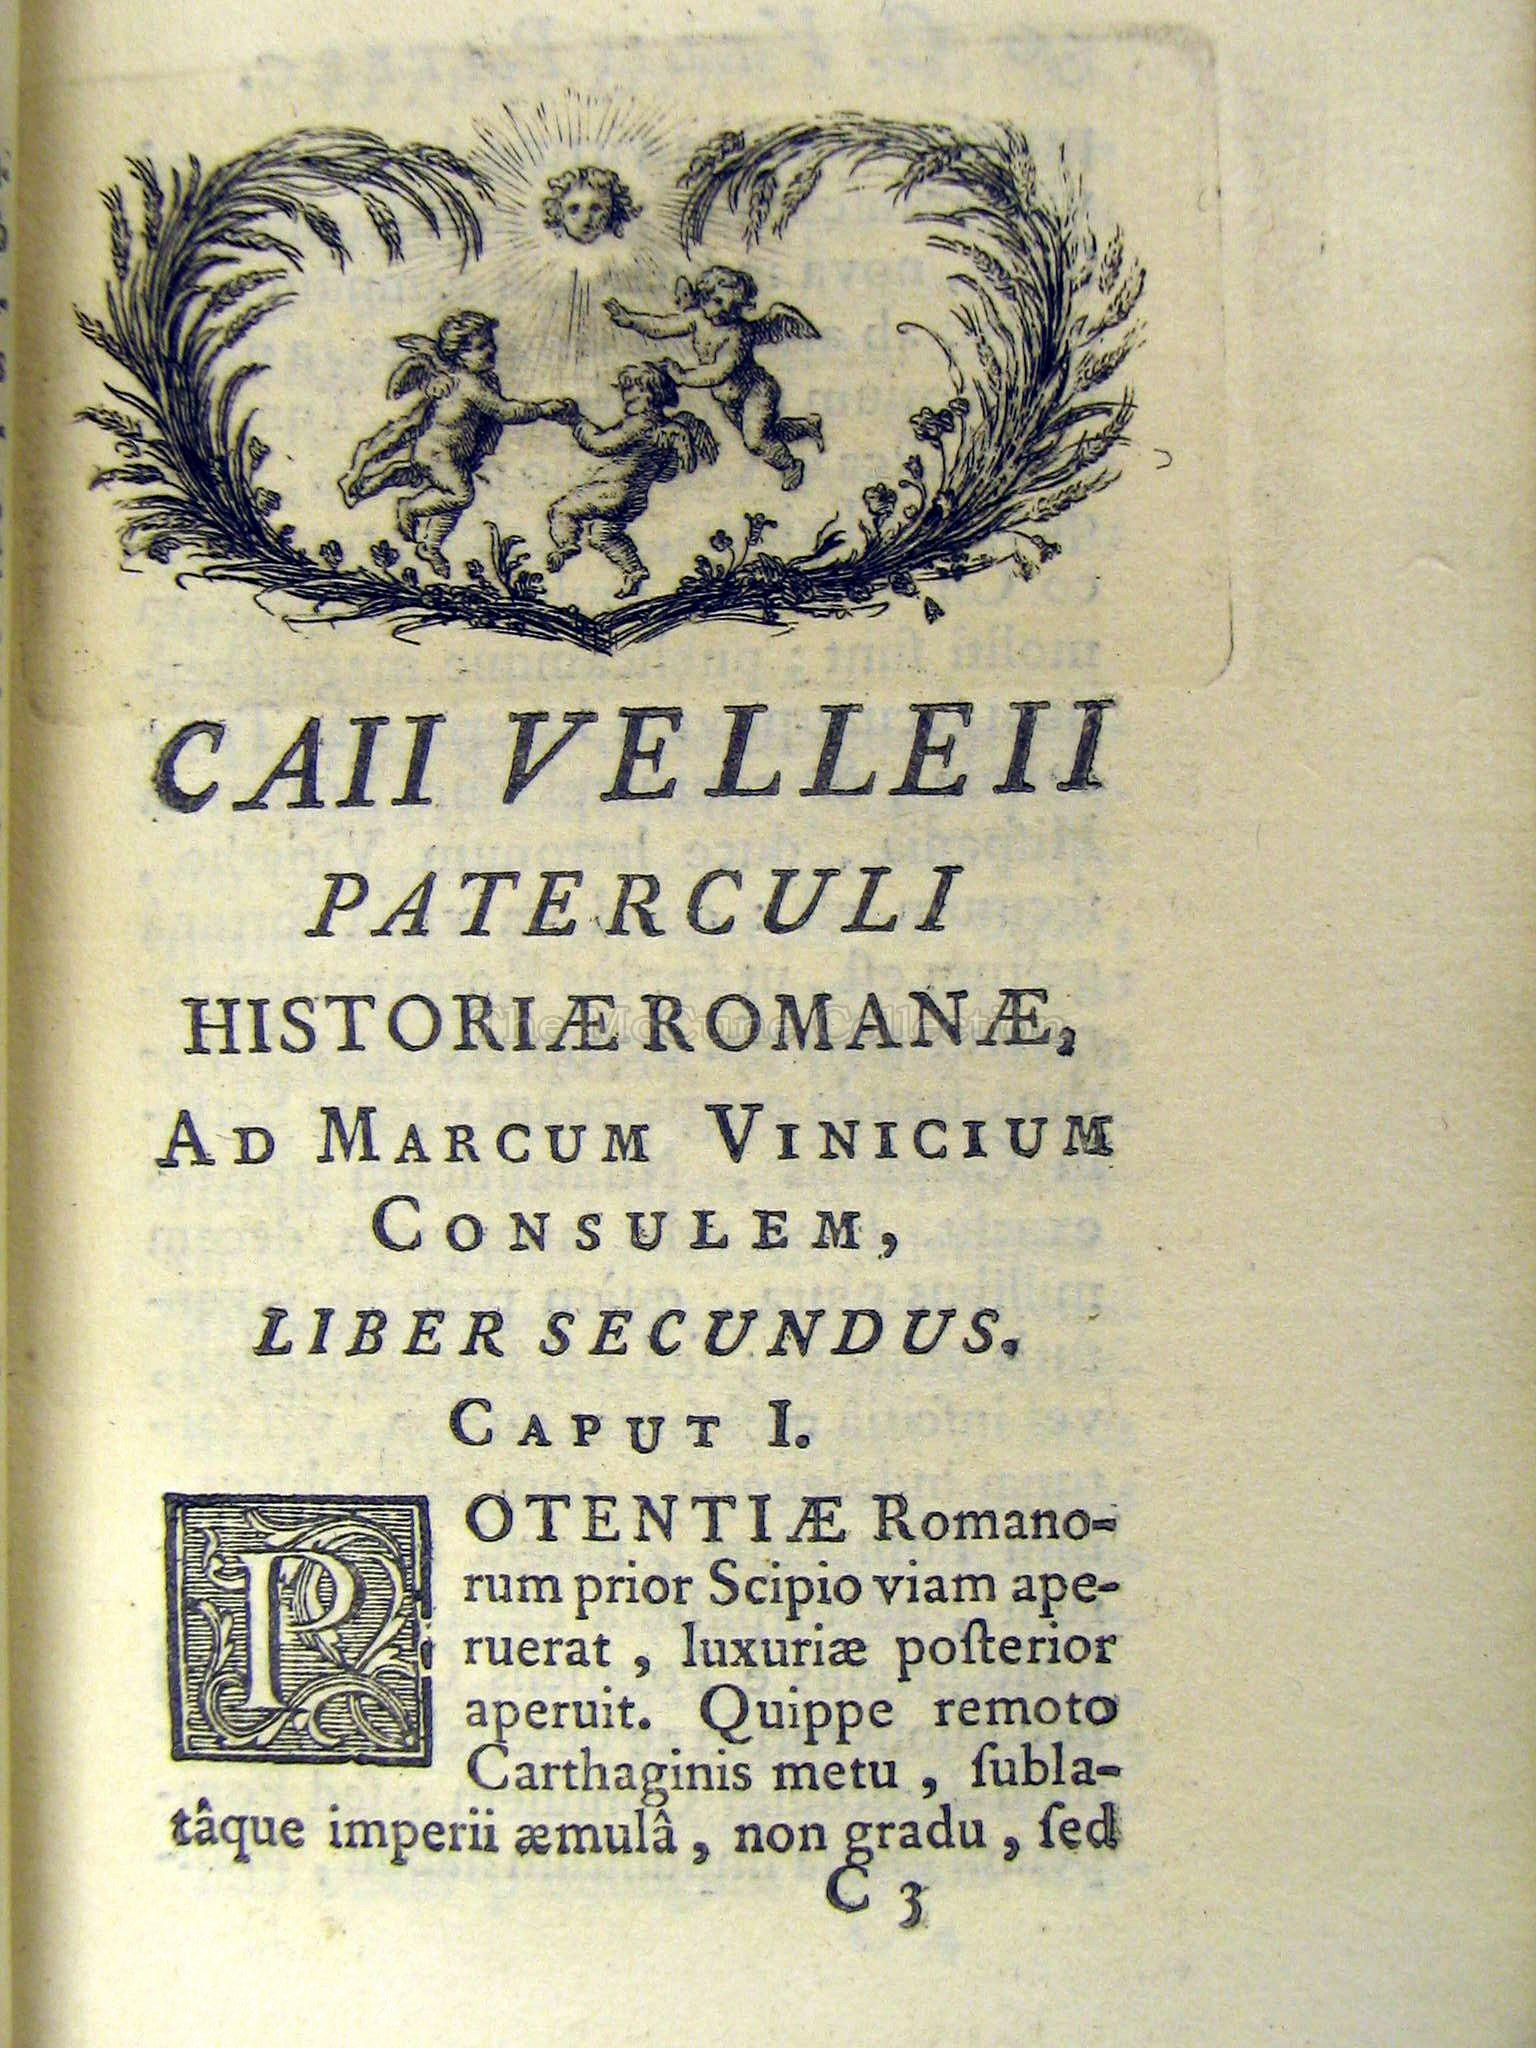 The McCune Collection: Caii Velleii Paterculi Historiae Libri Duo on